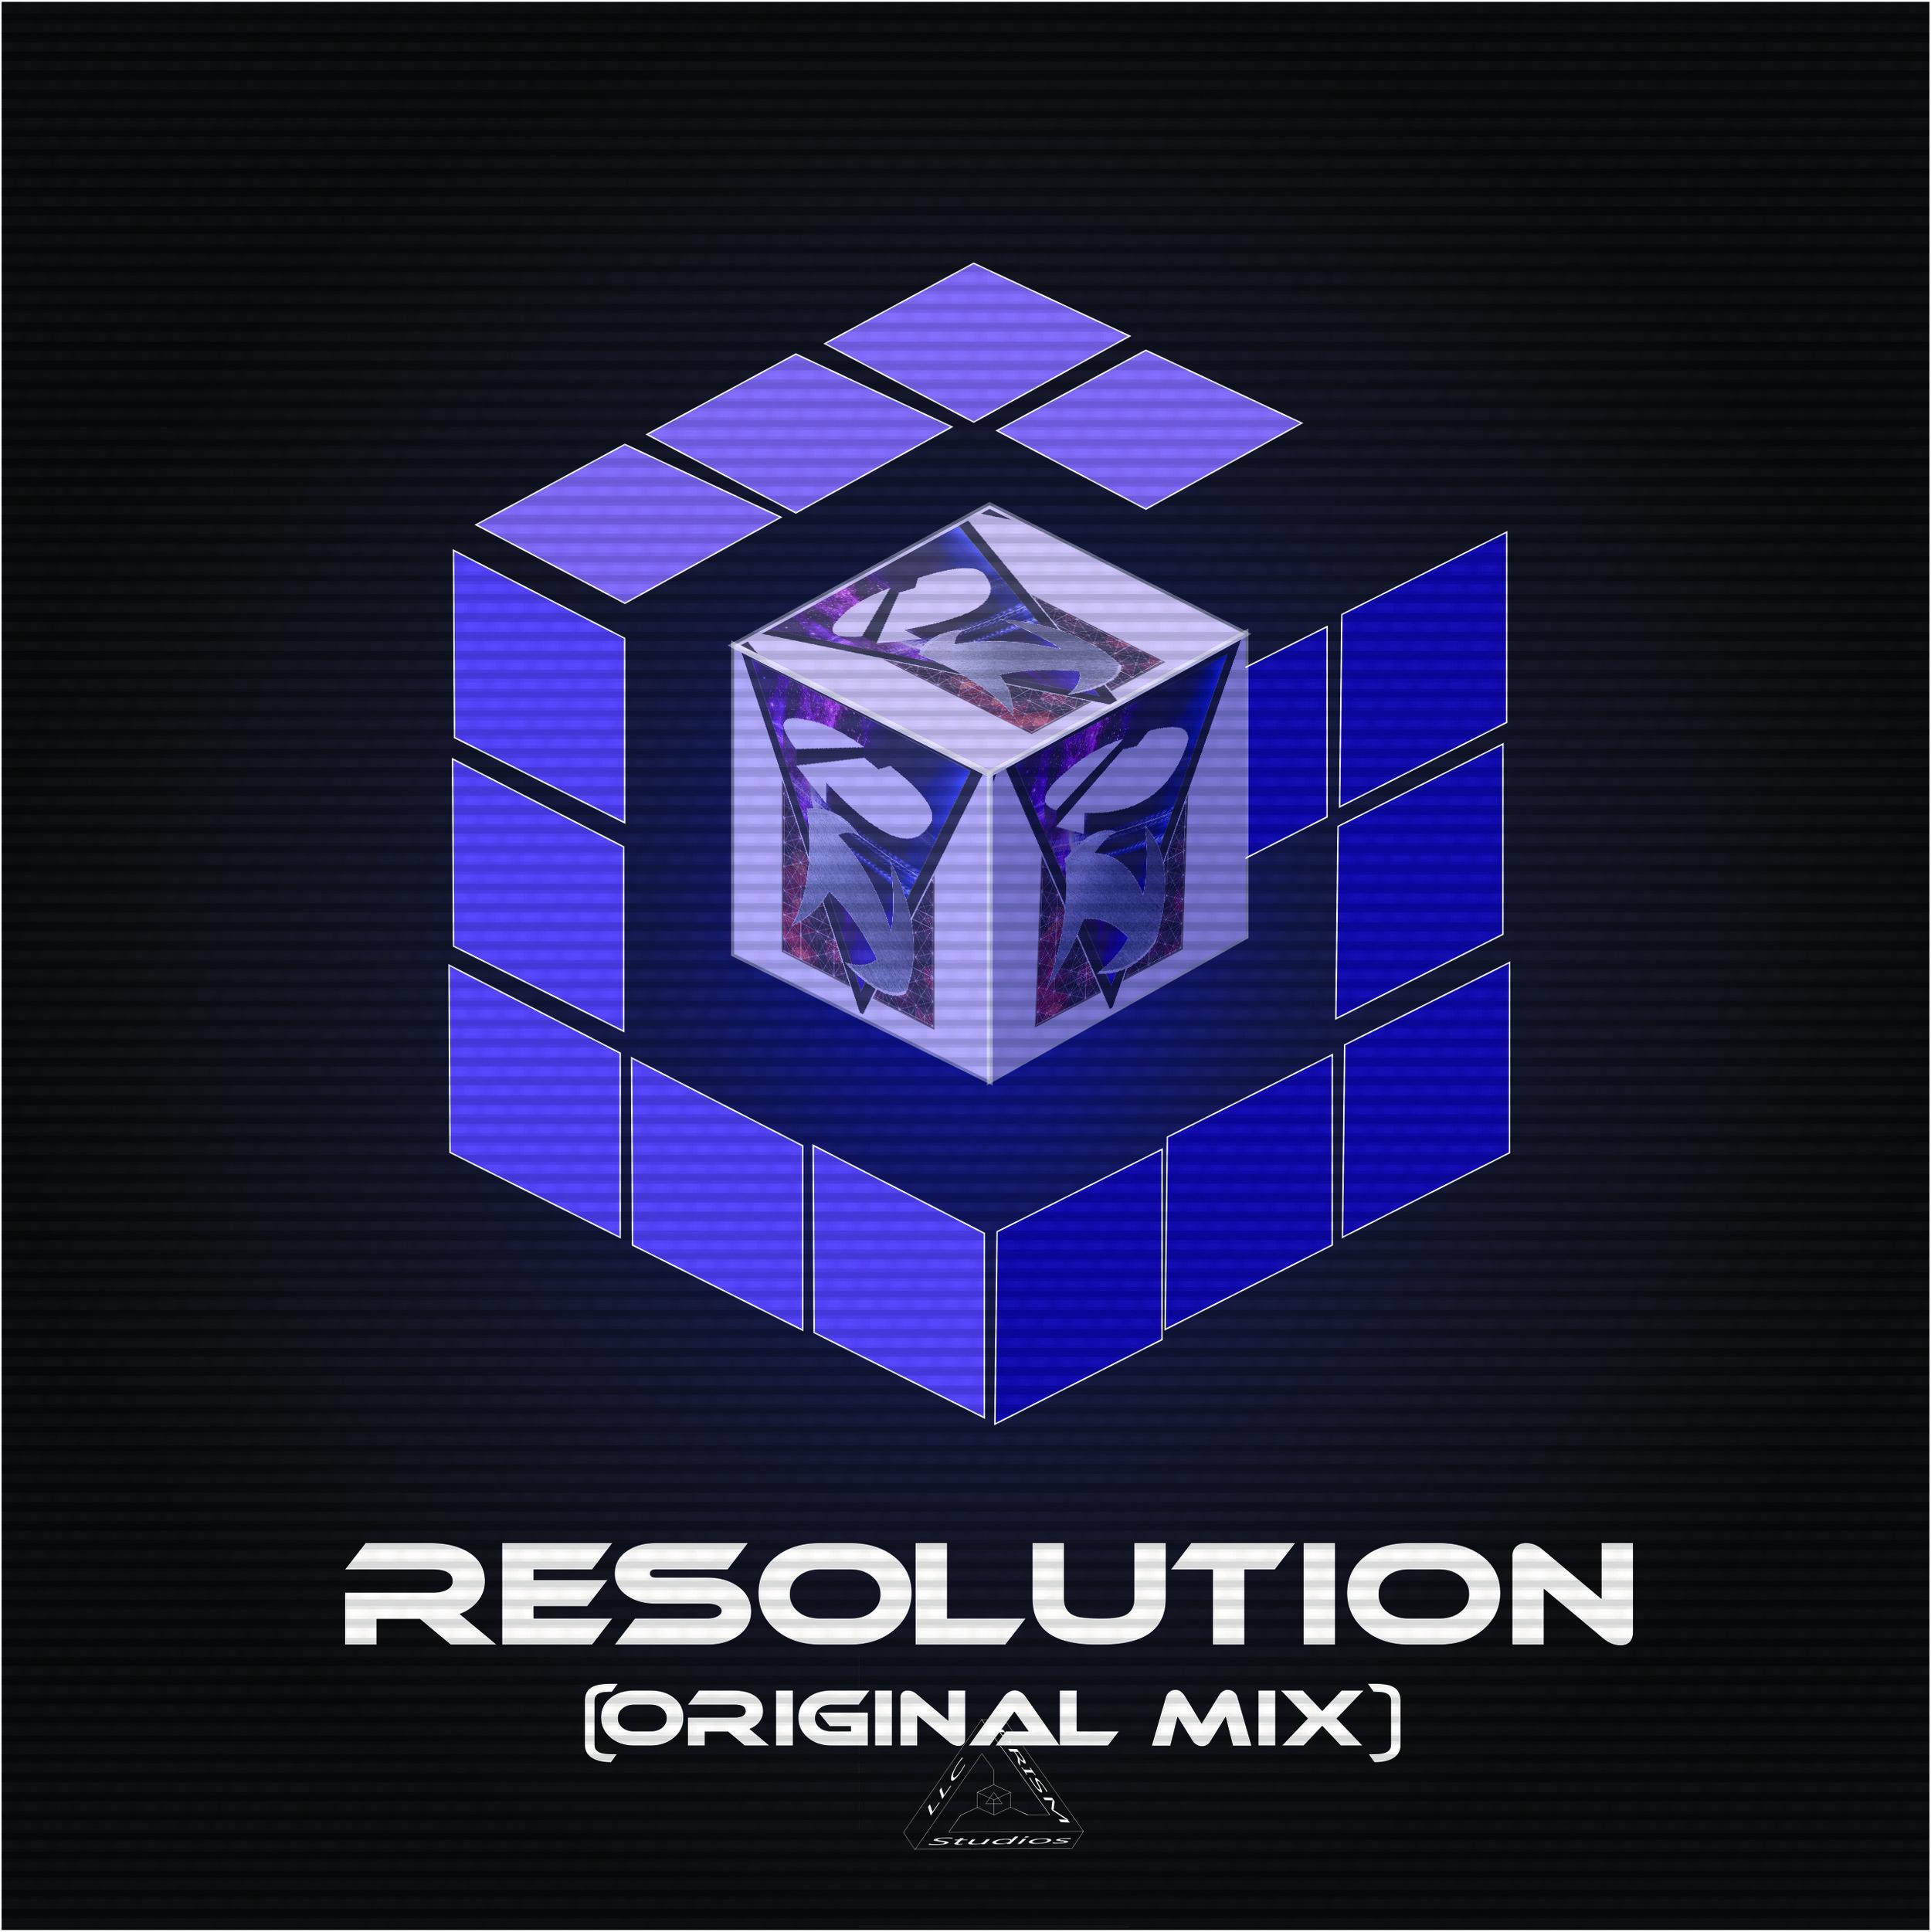 Resolution (original mix)